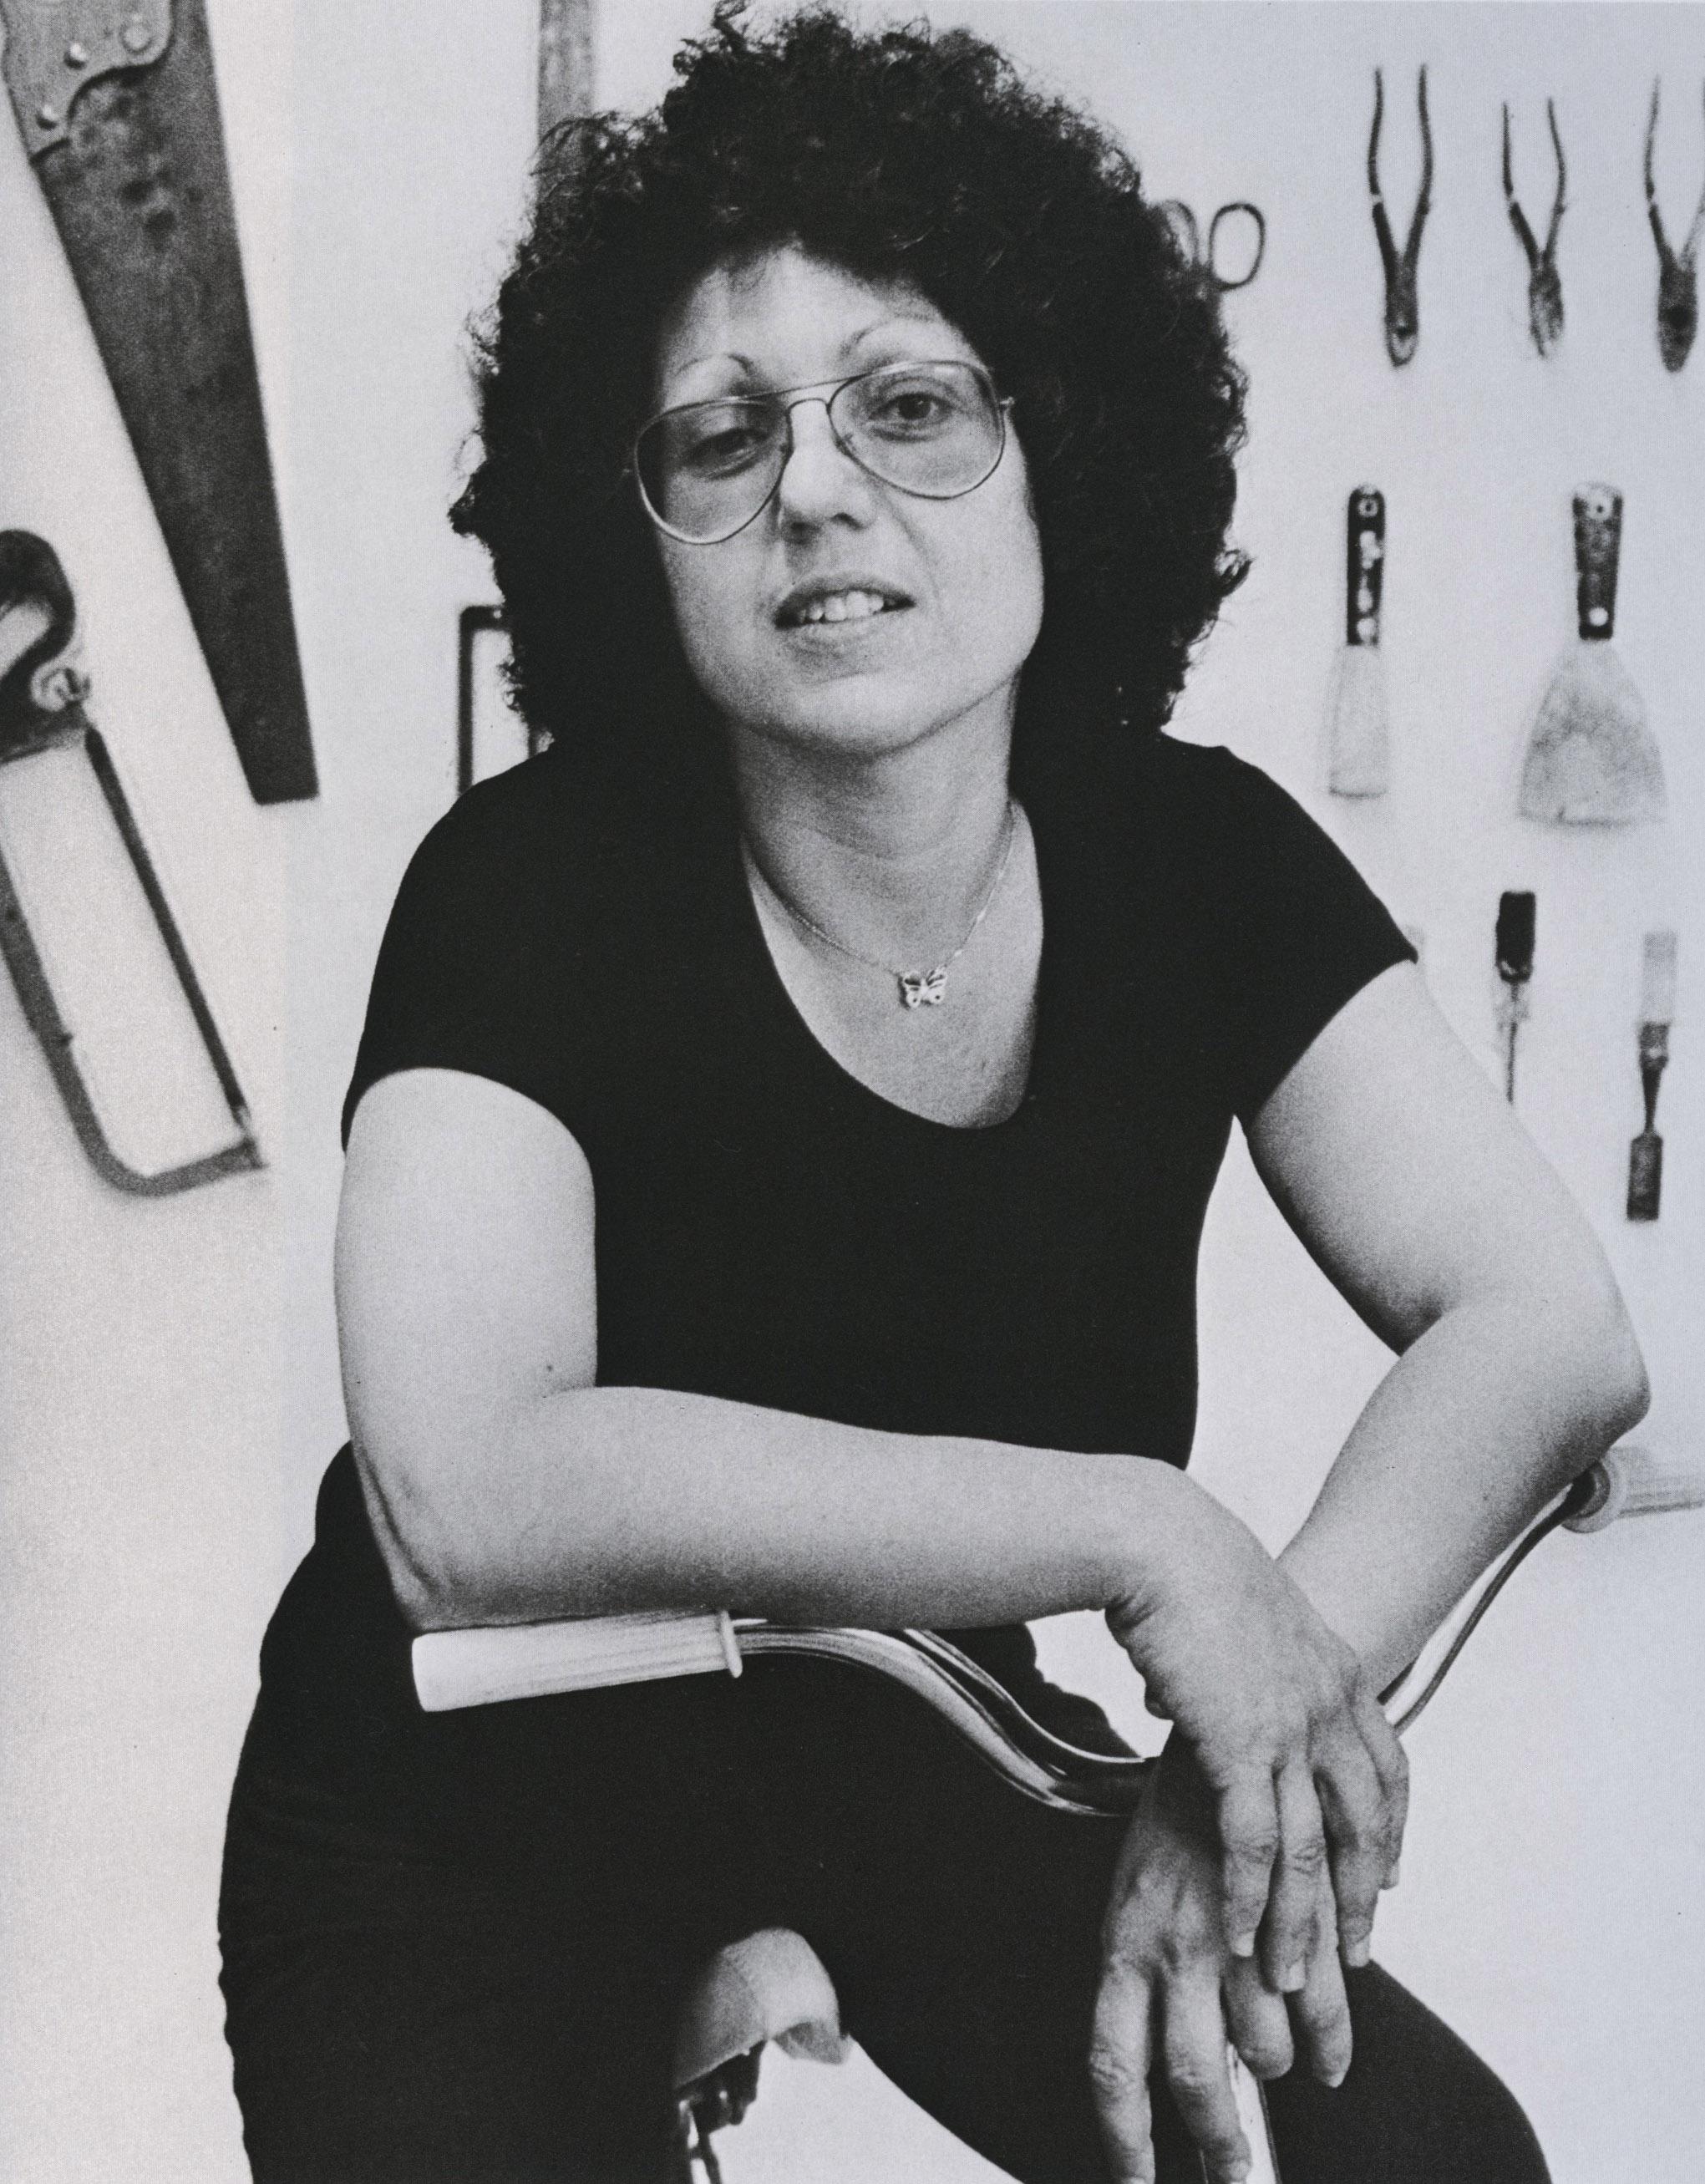 cynthia macadams_judy chicago, painter, 1976_p71